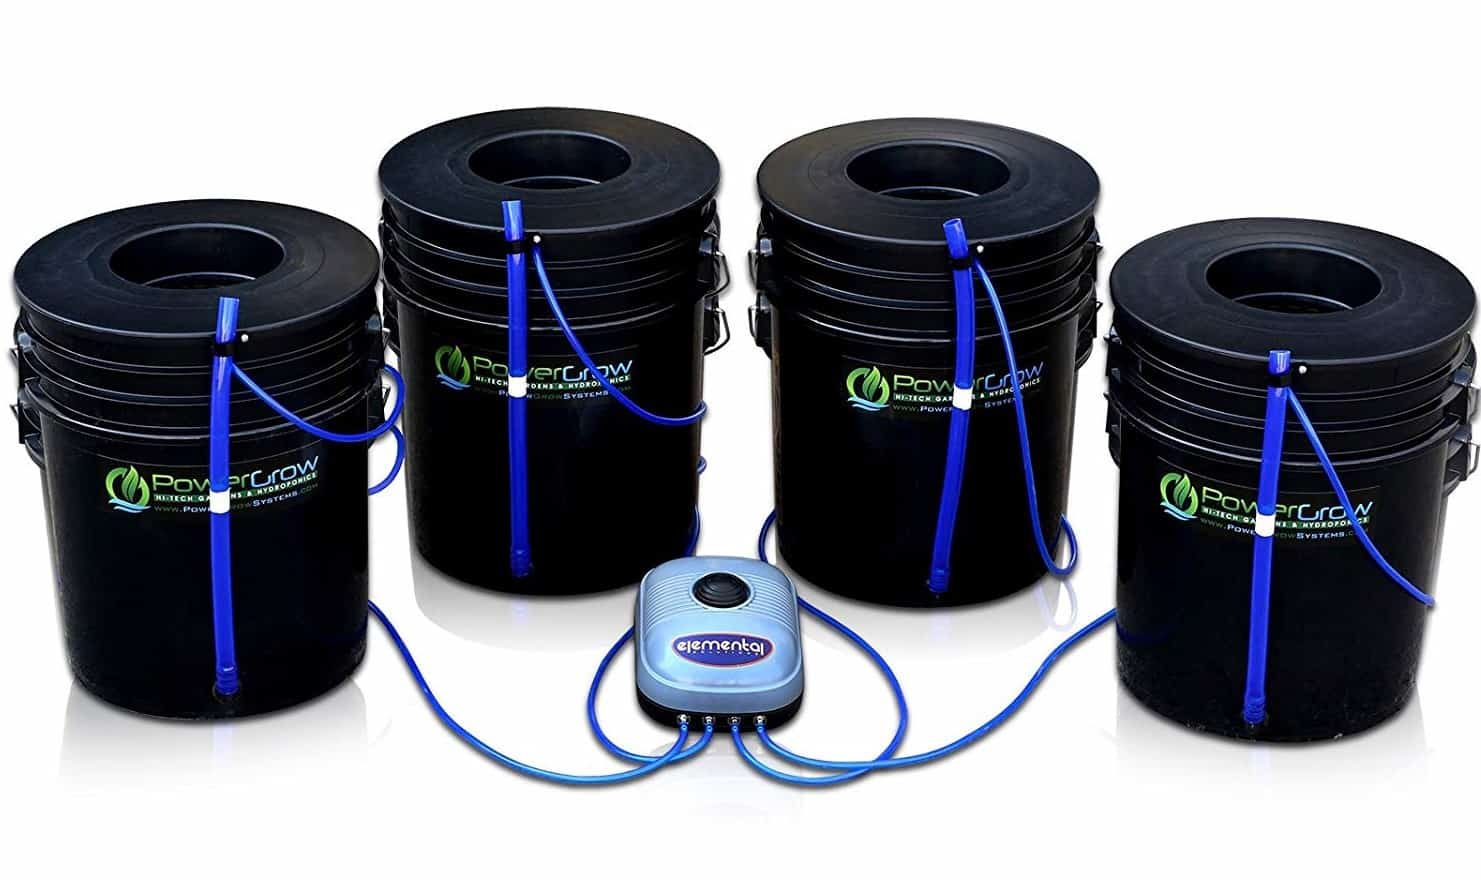 DWC Bucket Systems